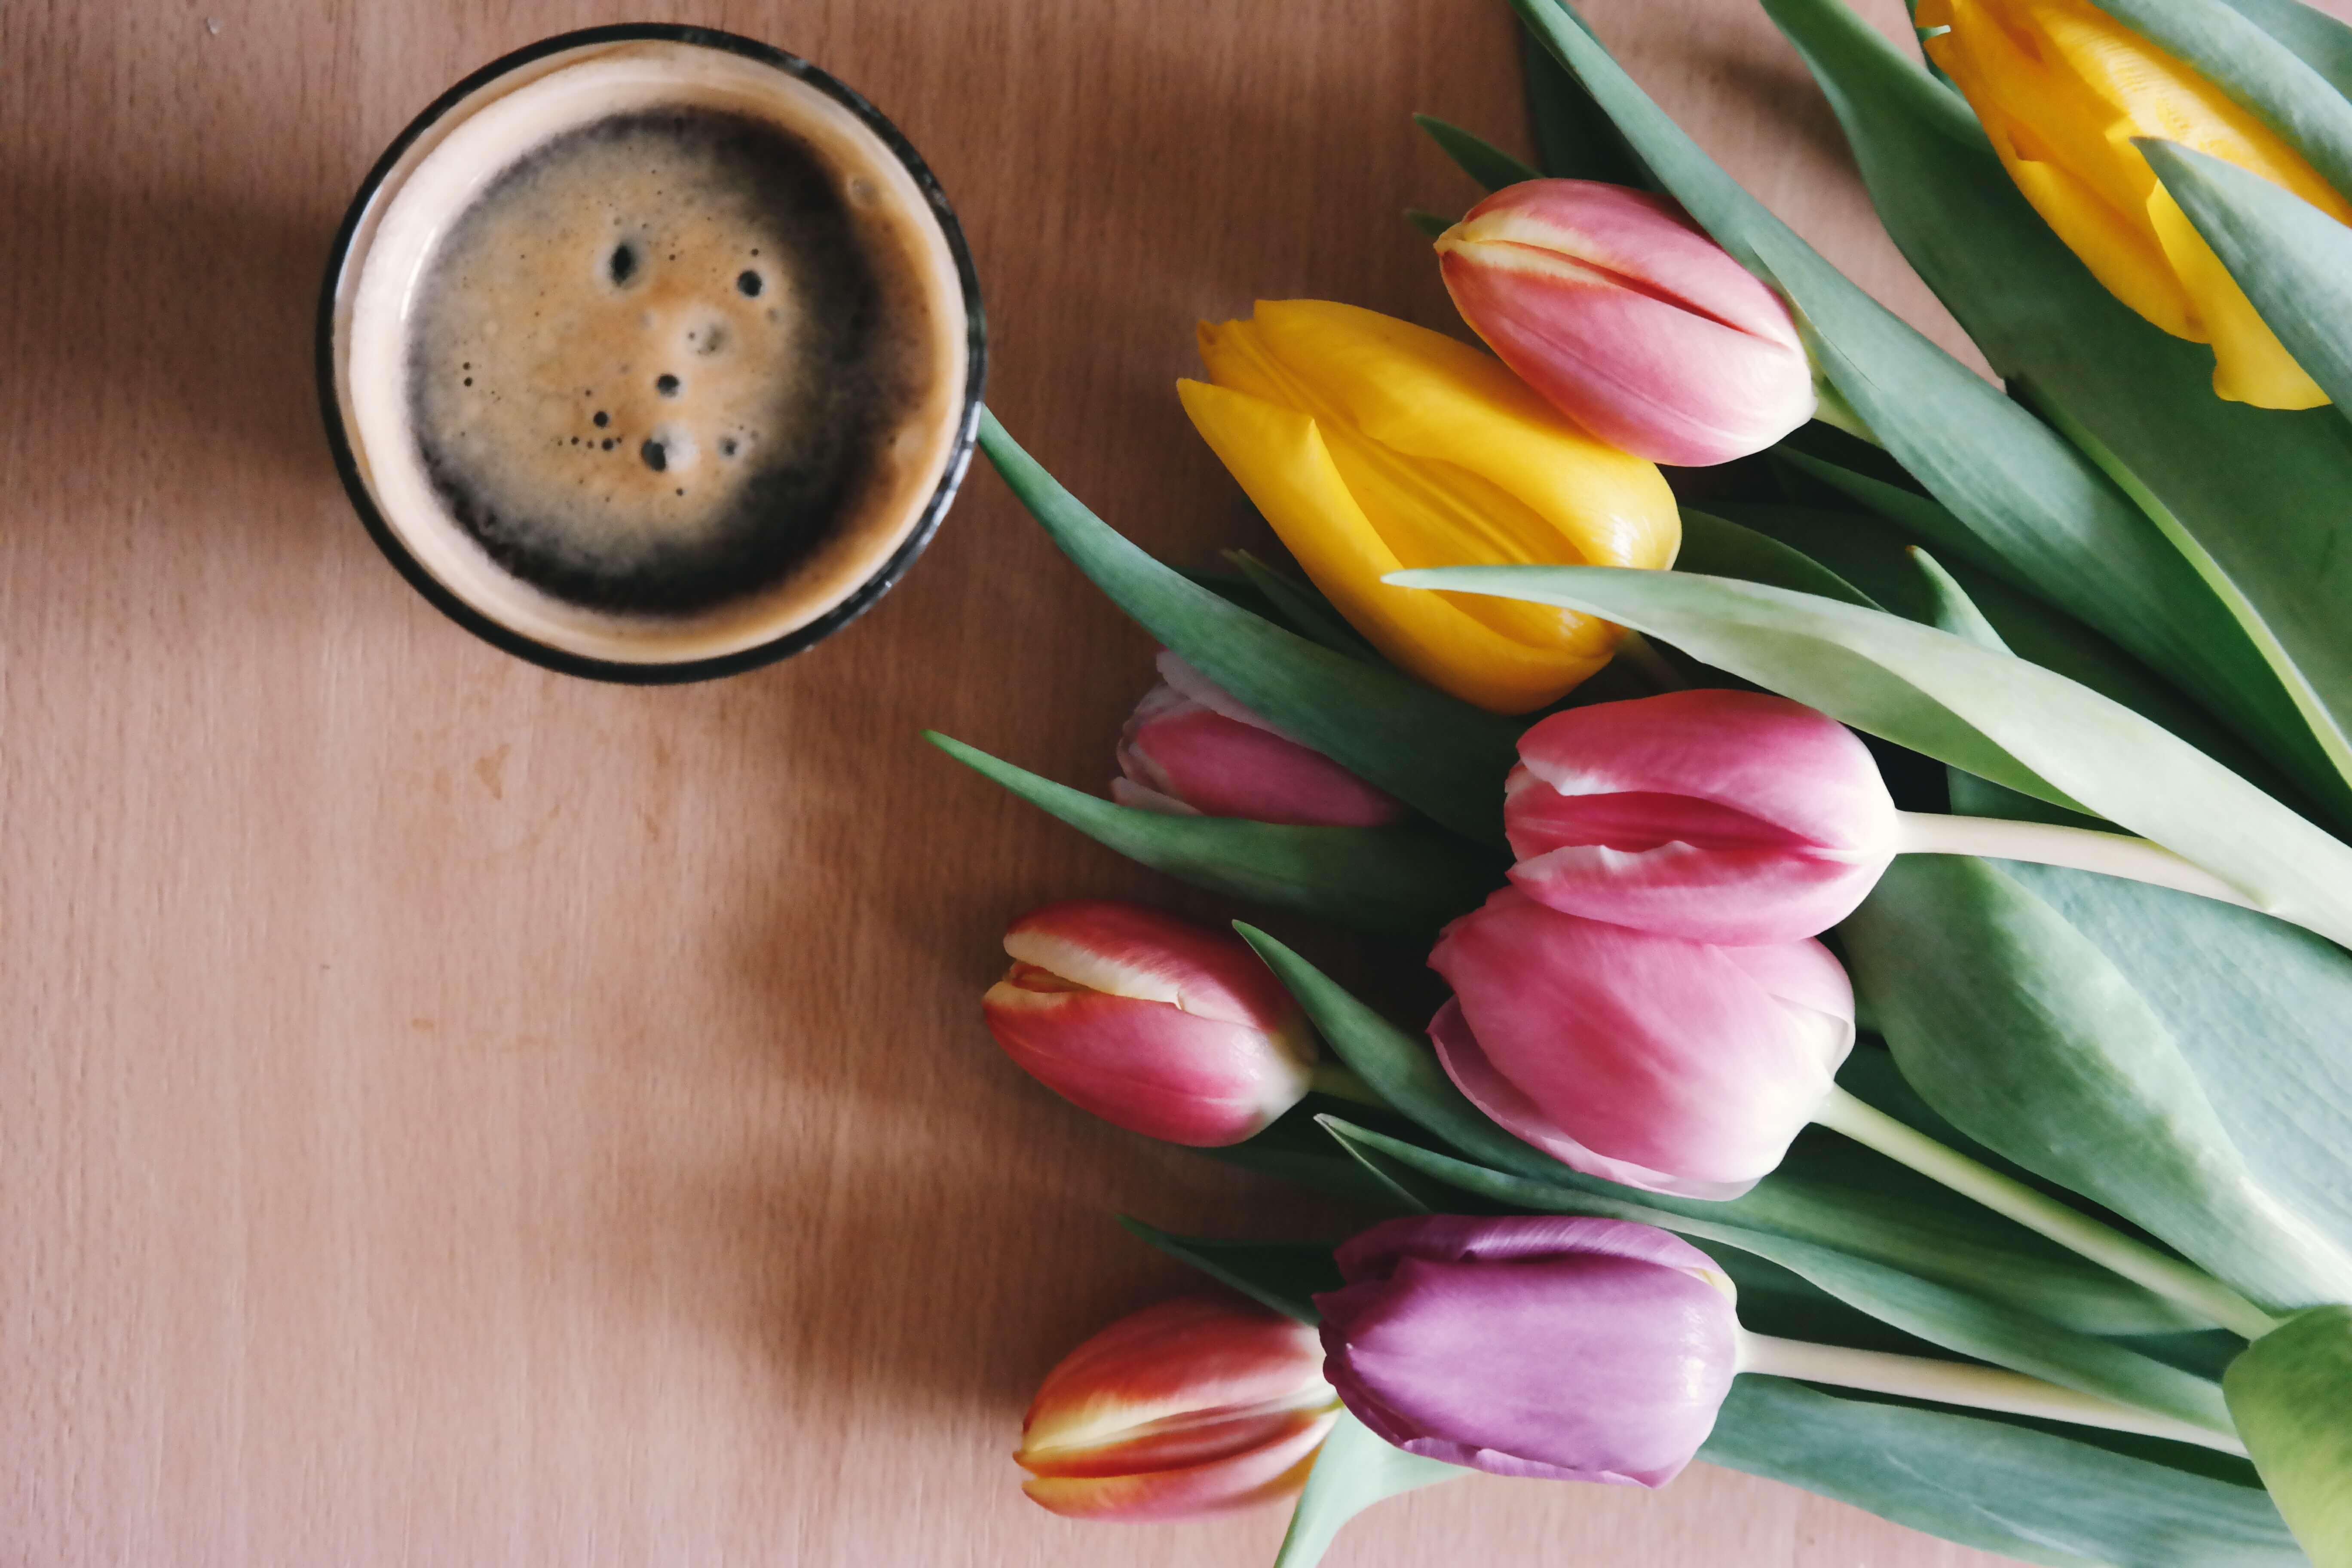 Tulip favourite flower